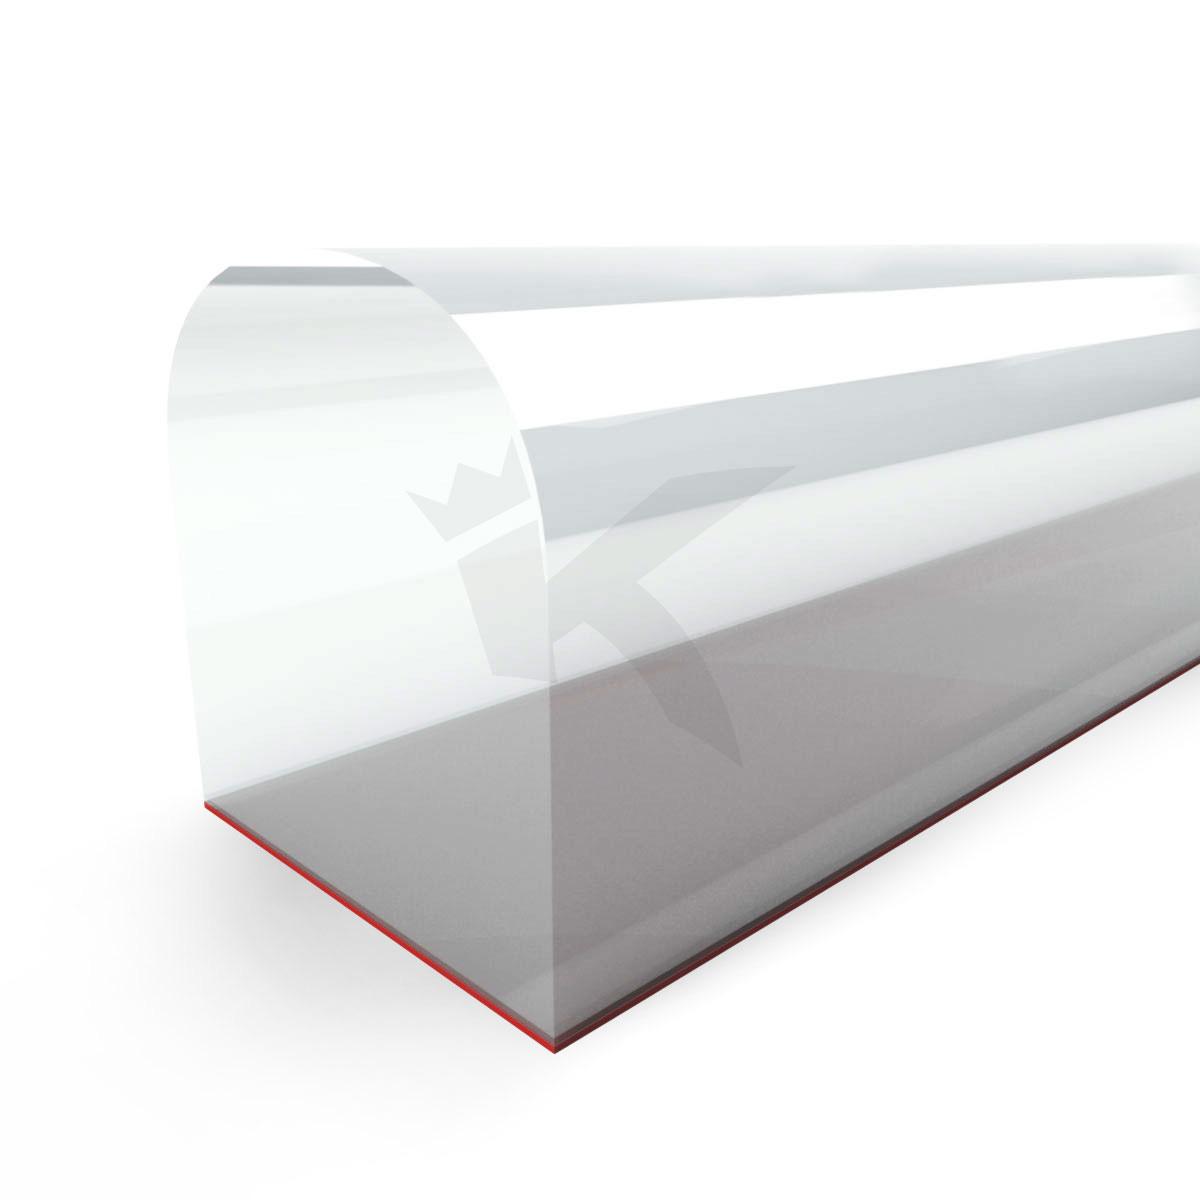 acryl dichtung glasdusche schwallschutz duschdichtung ersatzdichtung duschprofil ebay. Black Bedroom Furniture Sets. Home Design Ideas